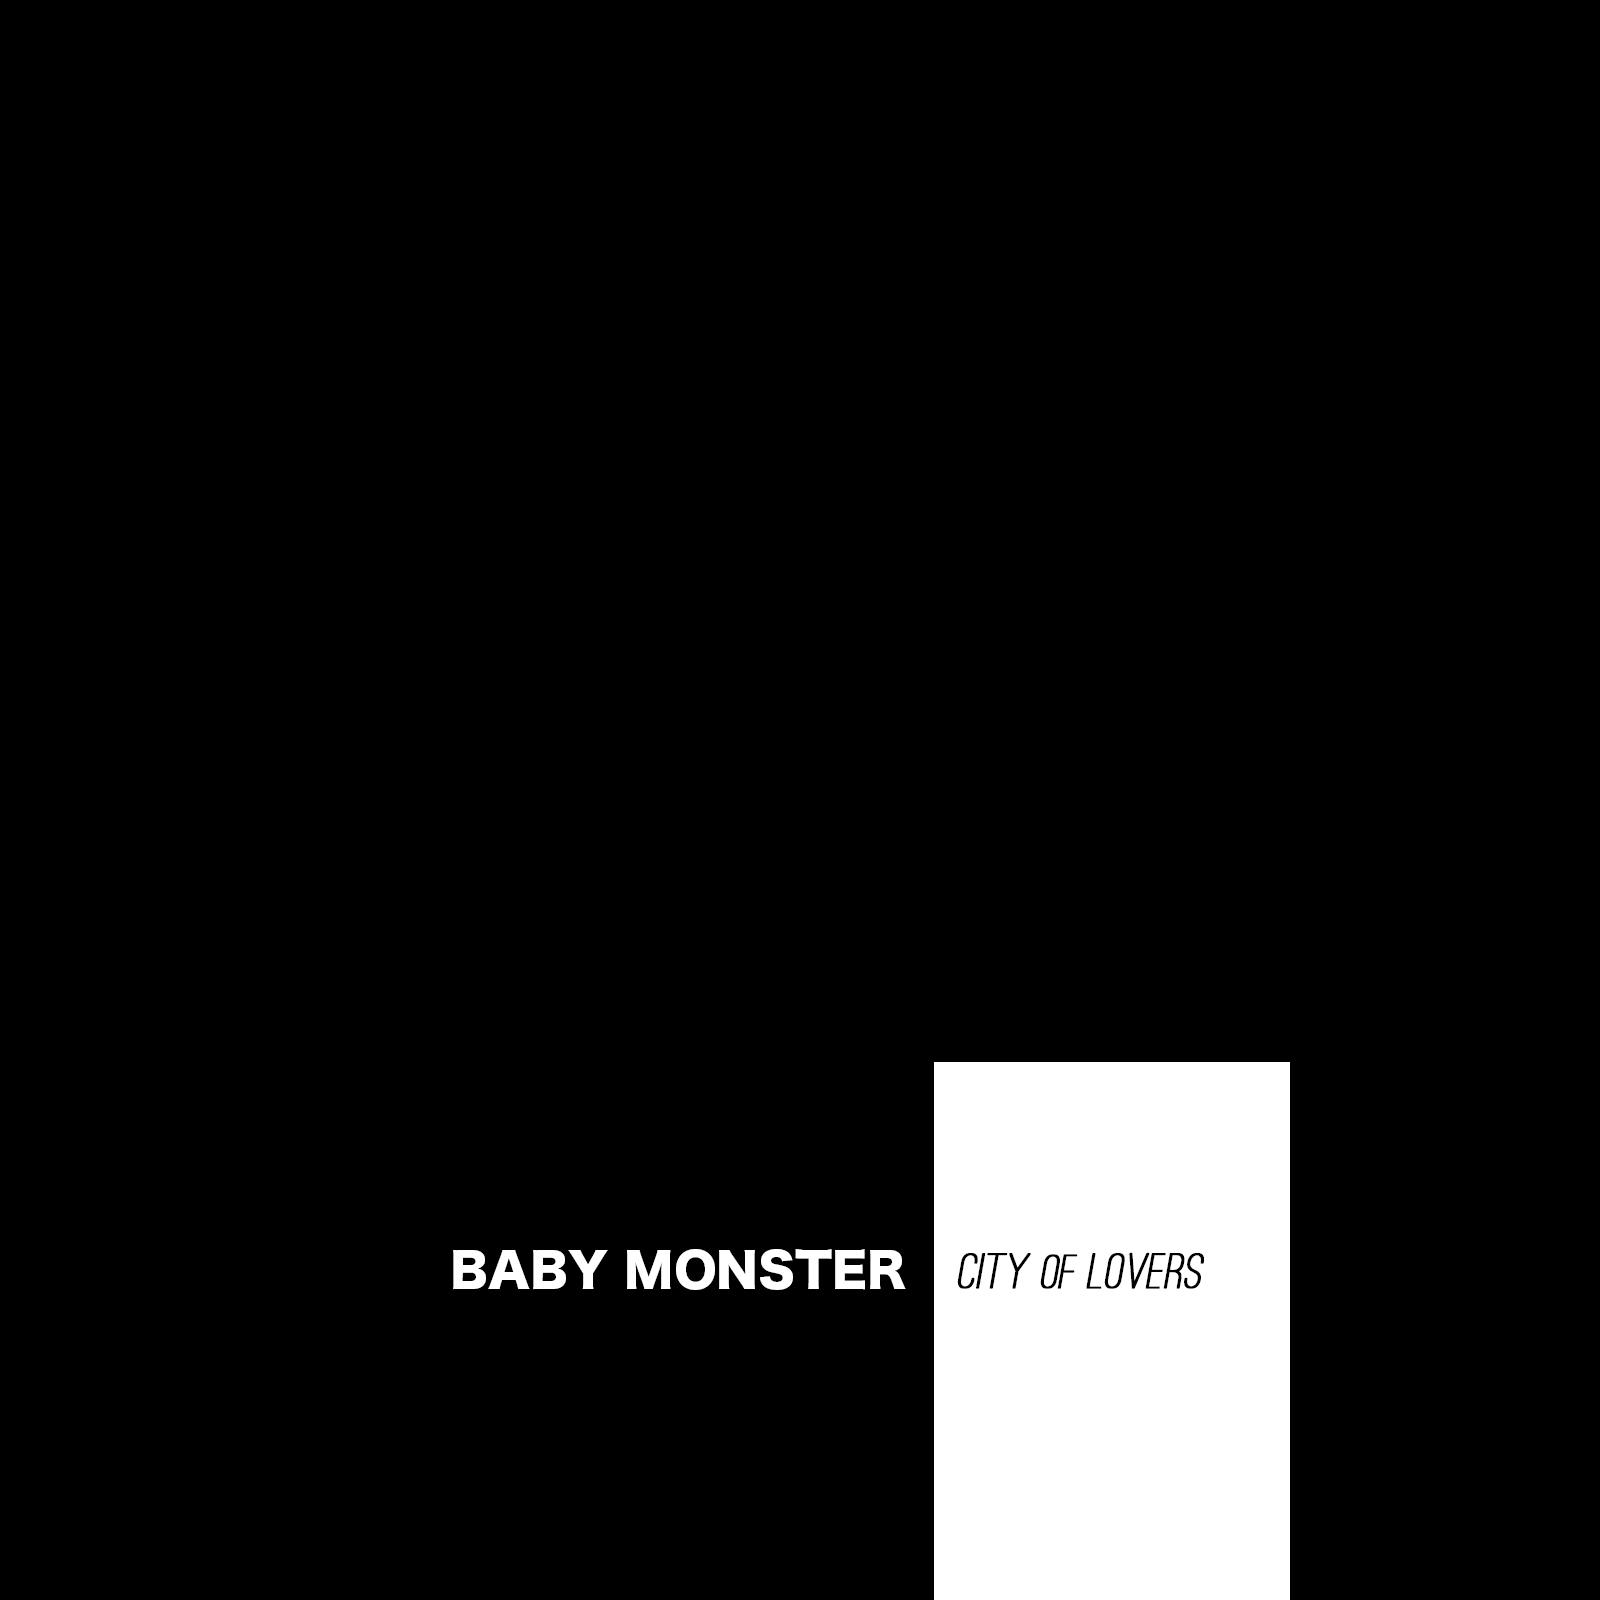 Baby Monster - City of Lovers E.P.